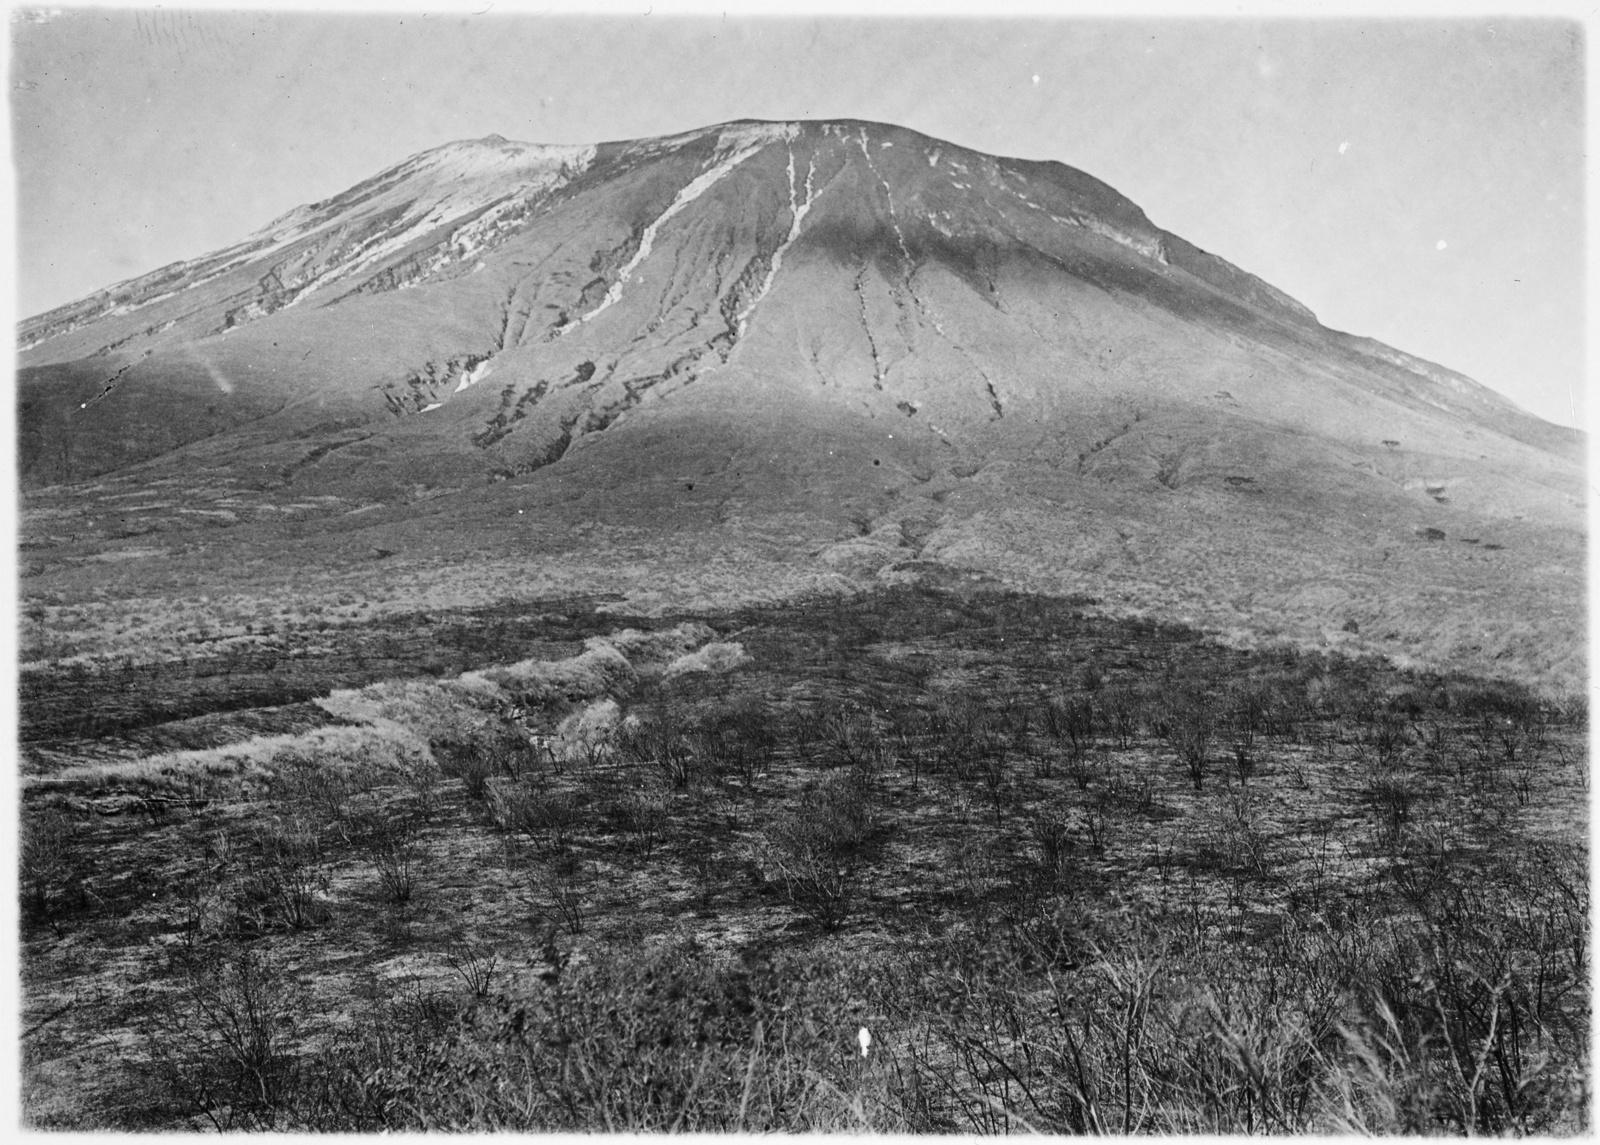 38. Вулкан Ол-Доиньо-Ленгаи с запада